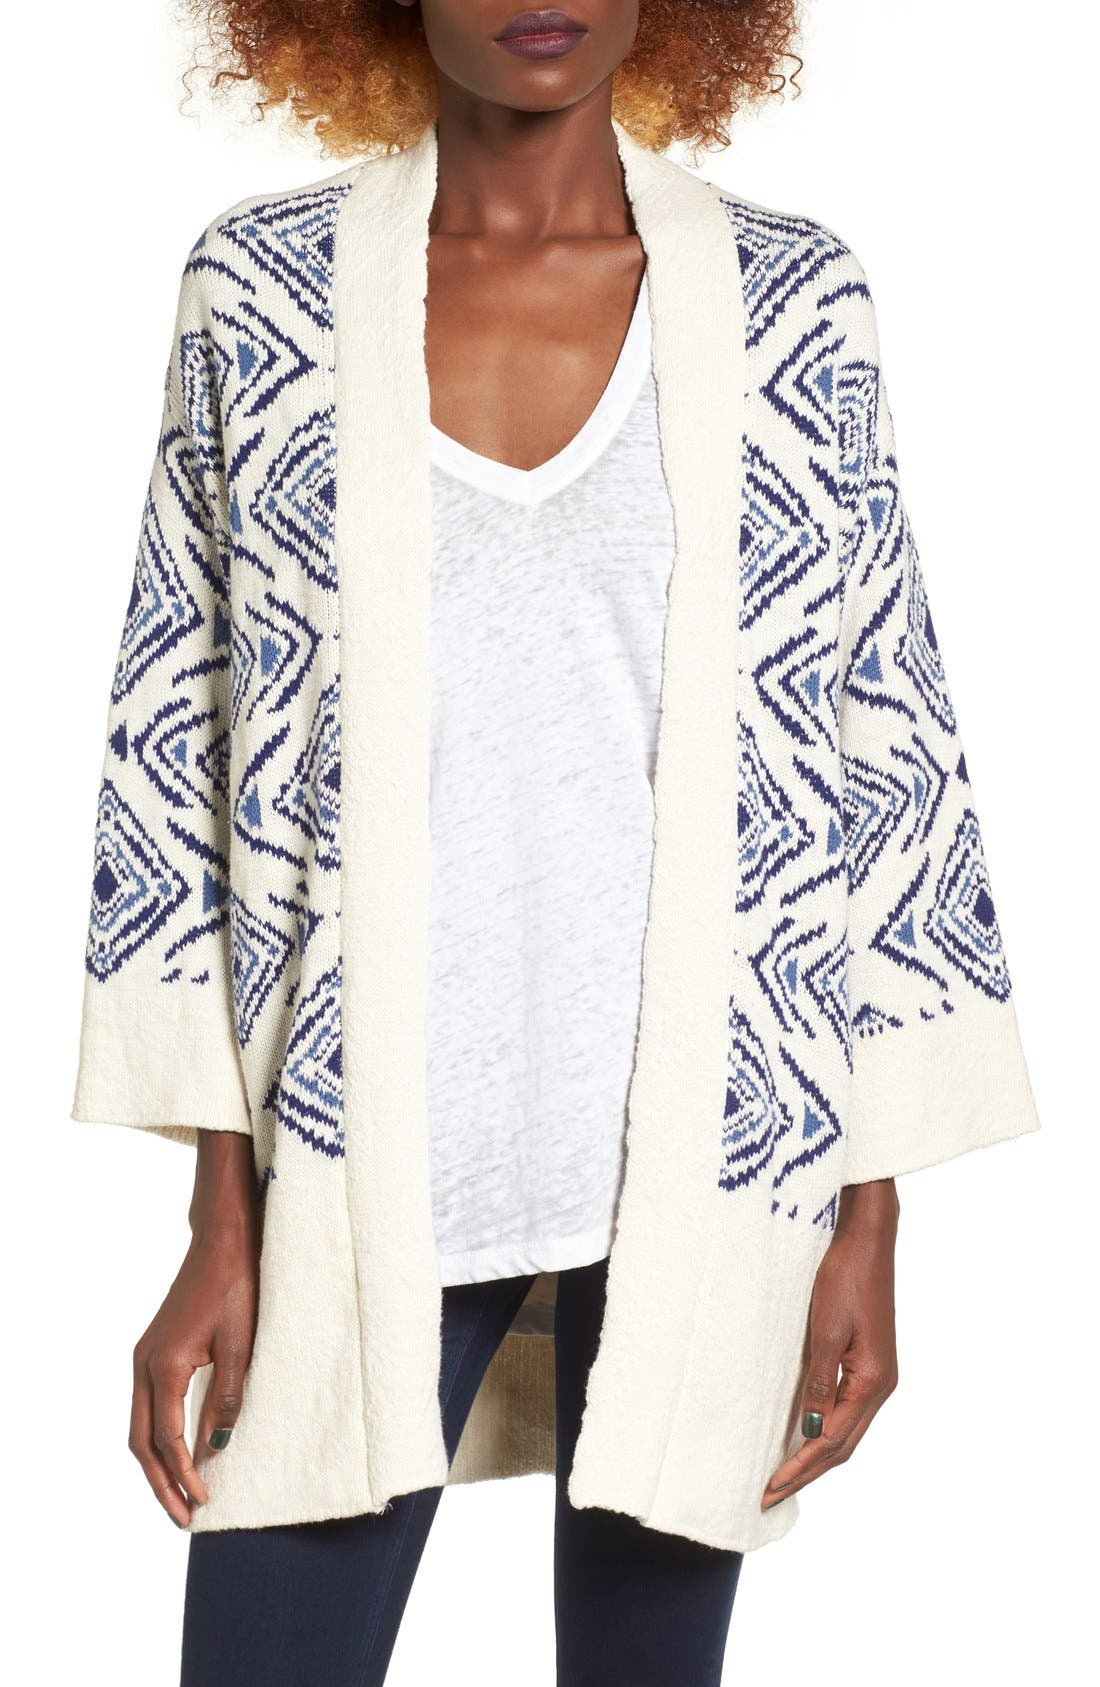 Alternate Image 1 Selected - Roxy Always Forever Kimono Cardigan